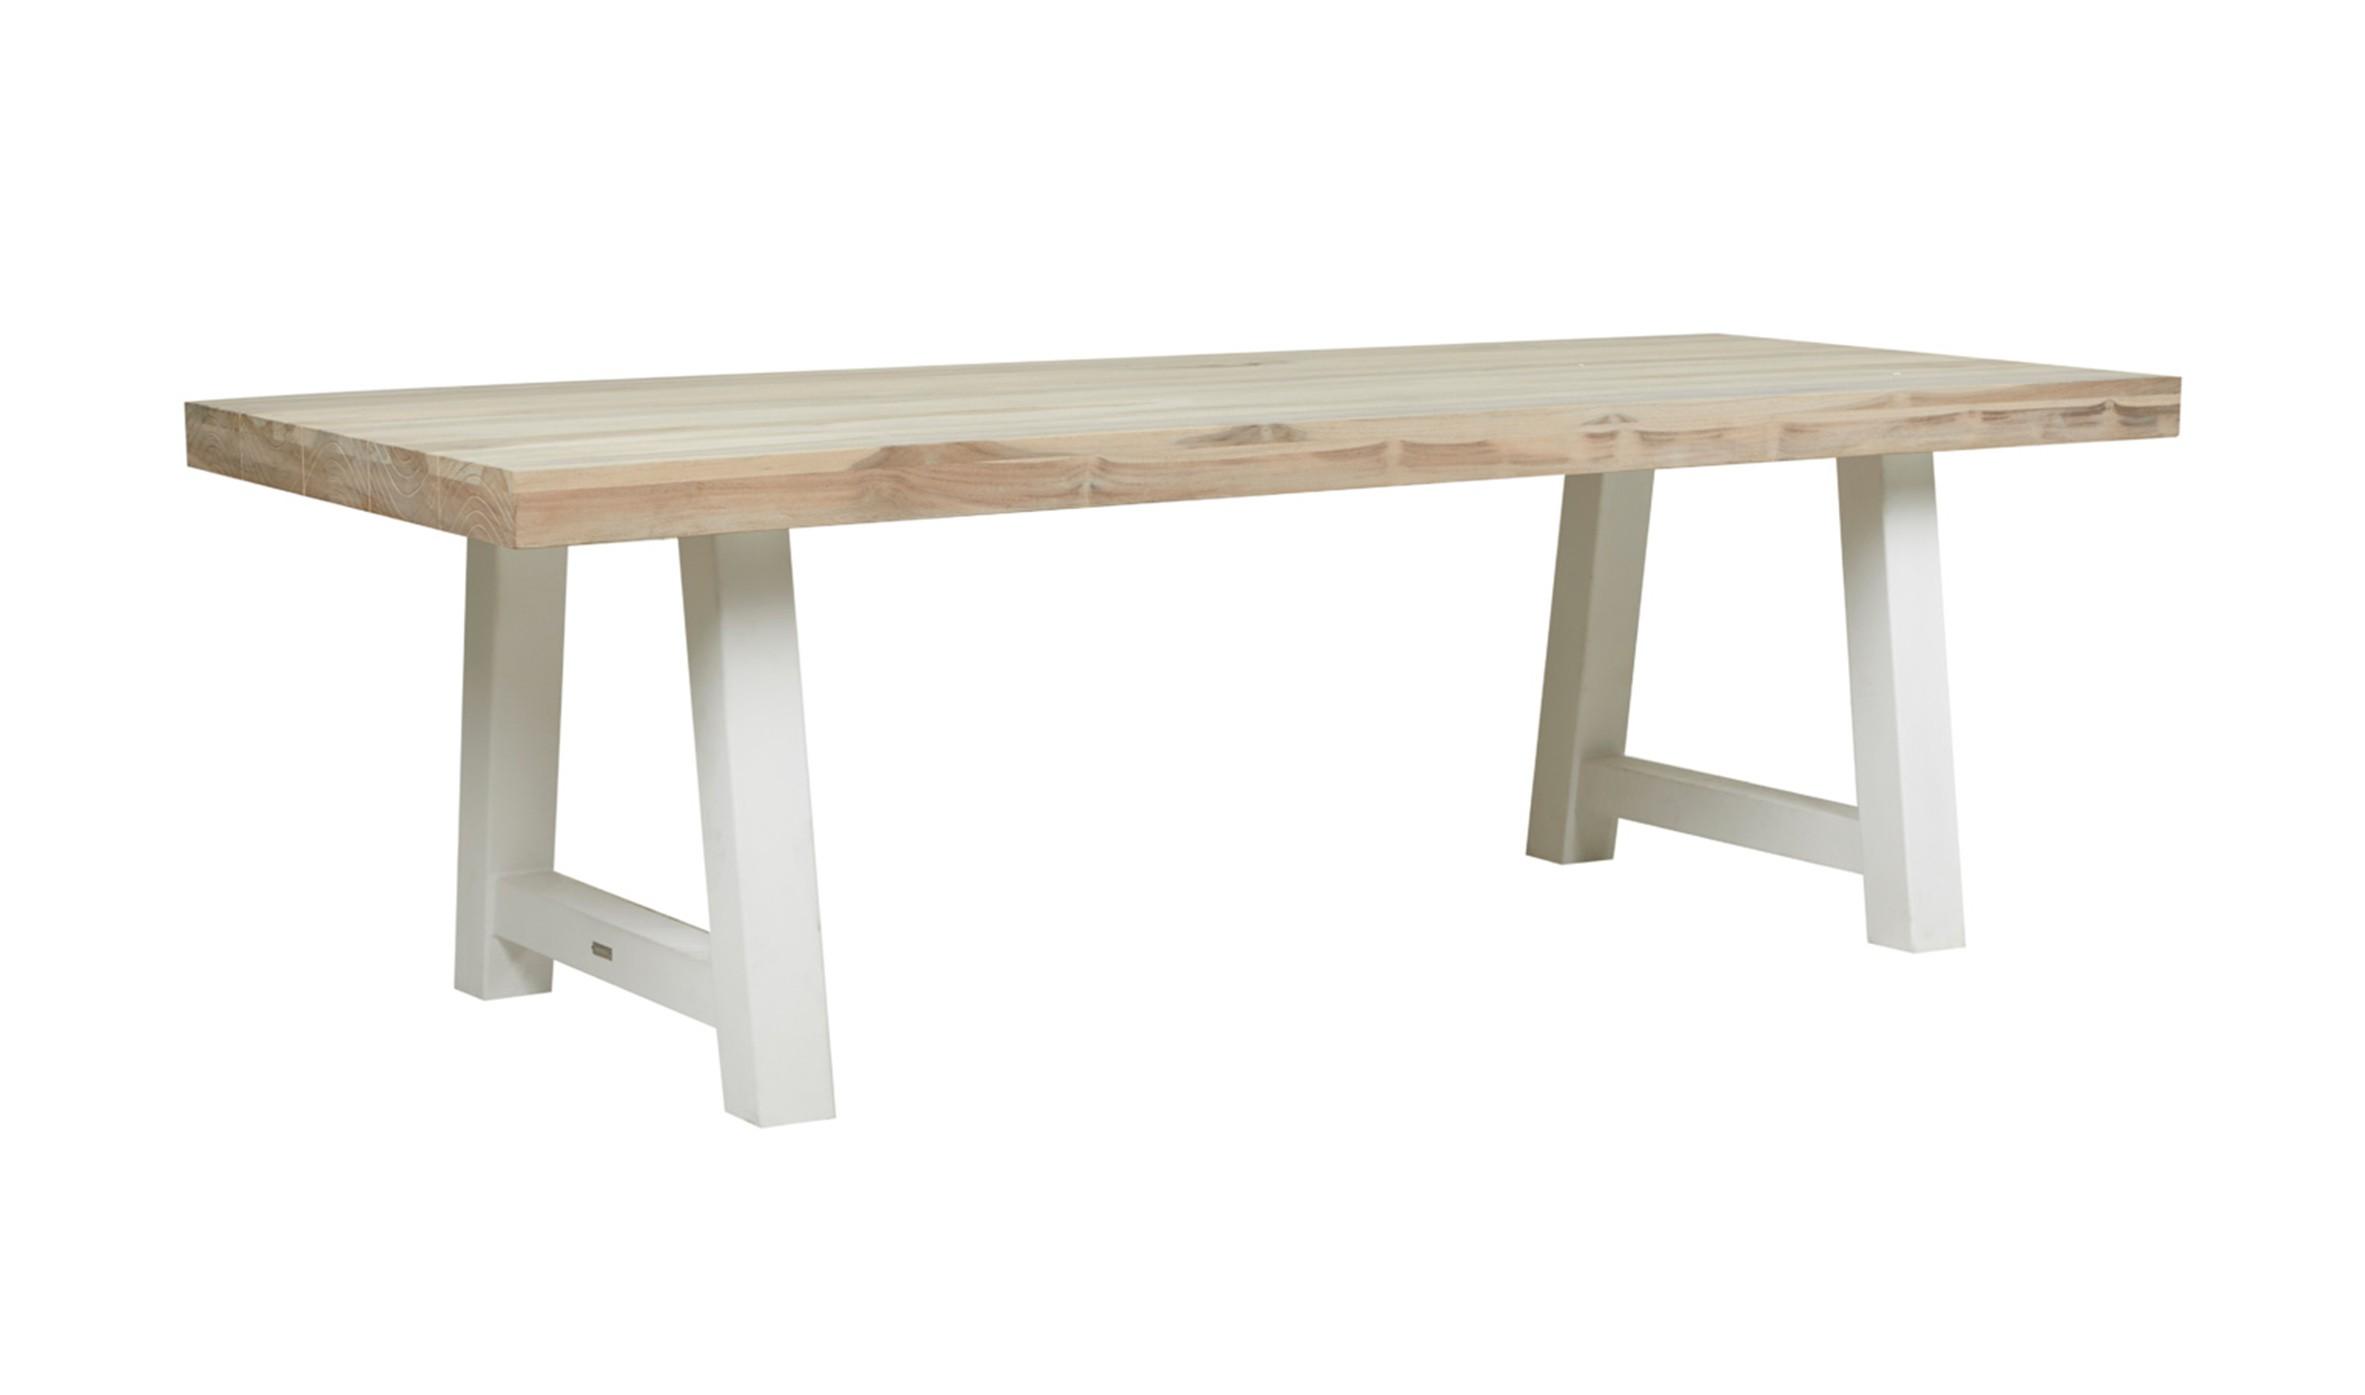 Furniture Thumbnails outdoor-dining-tables-granada-beach-granada-beach-tab-10S